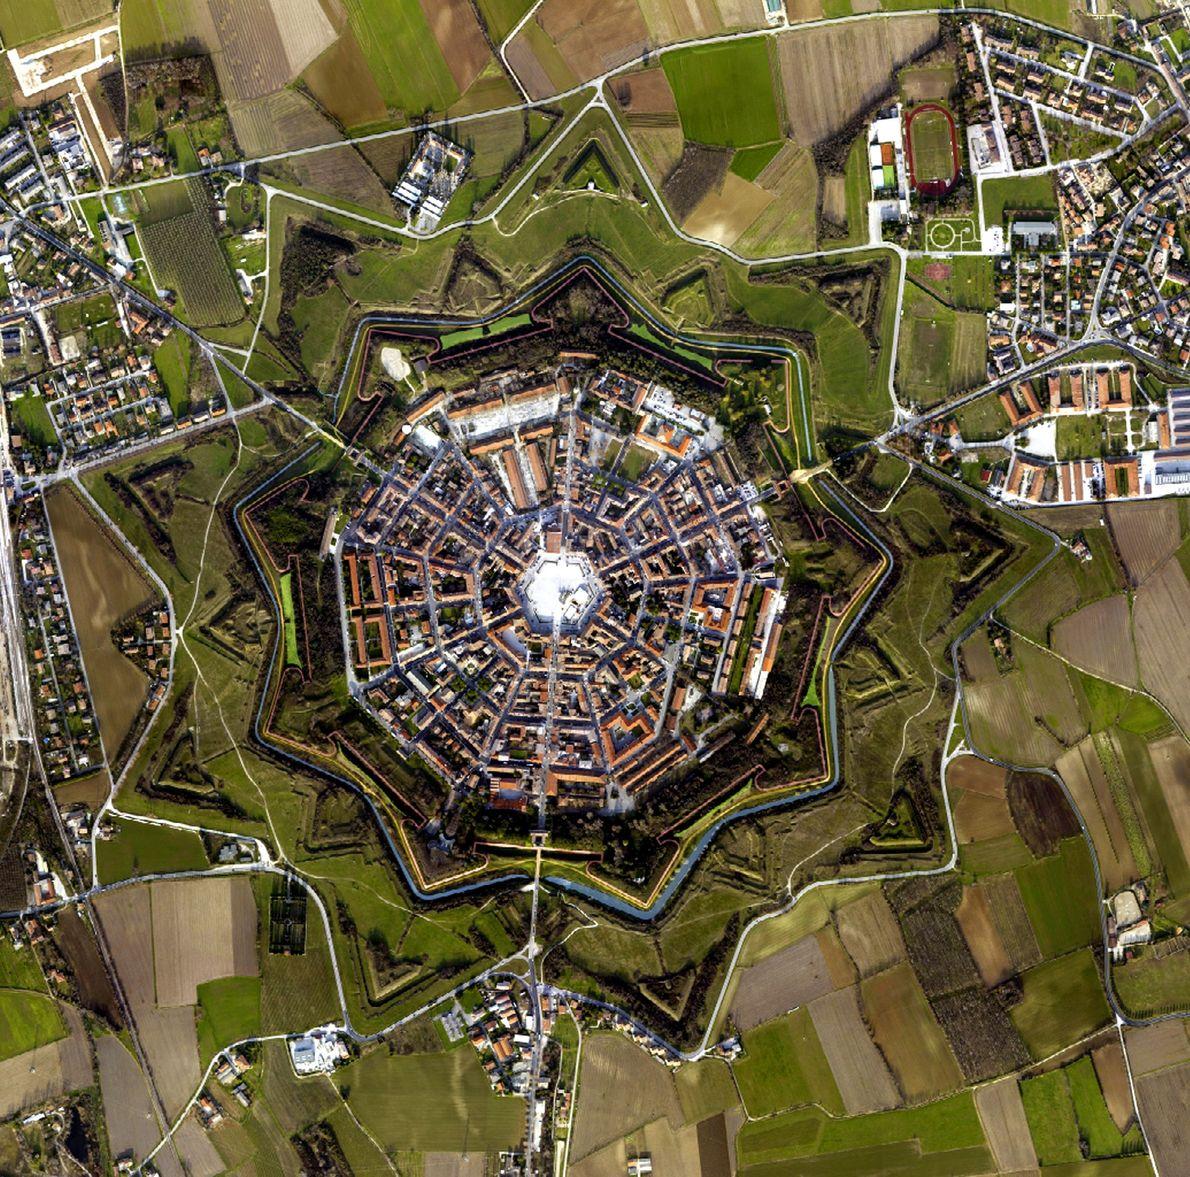 SISTEMA DE DEFESA DE VENEZA, Património Mundial da UNESCO